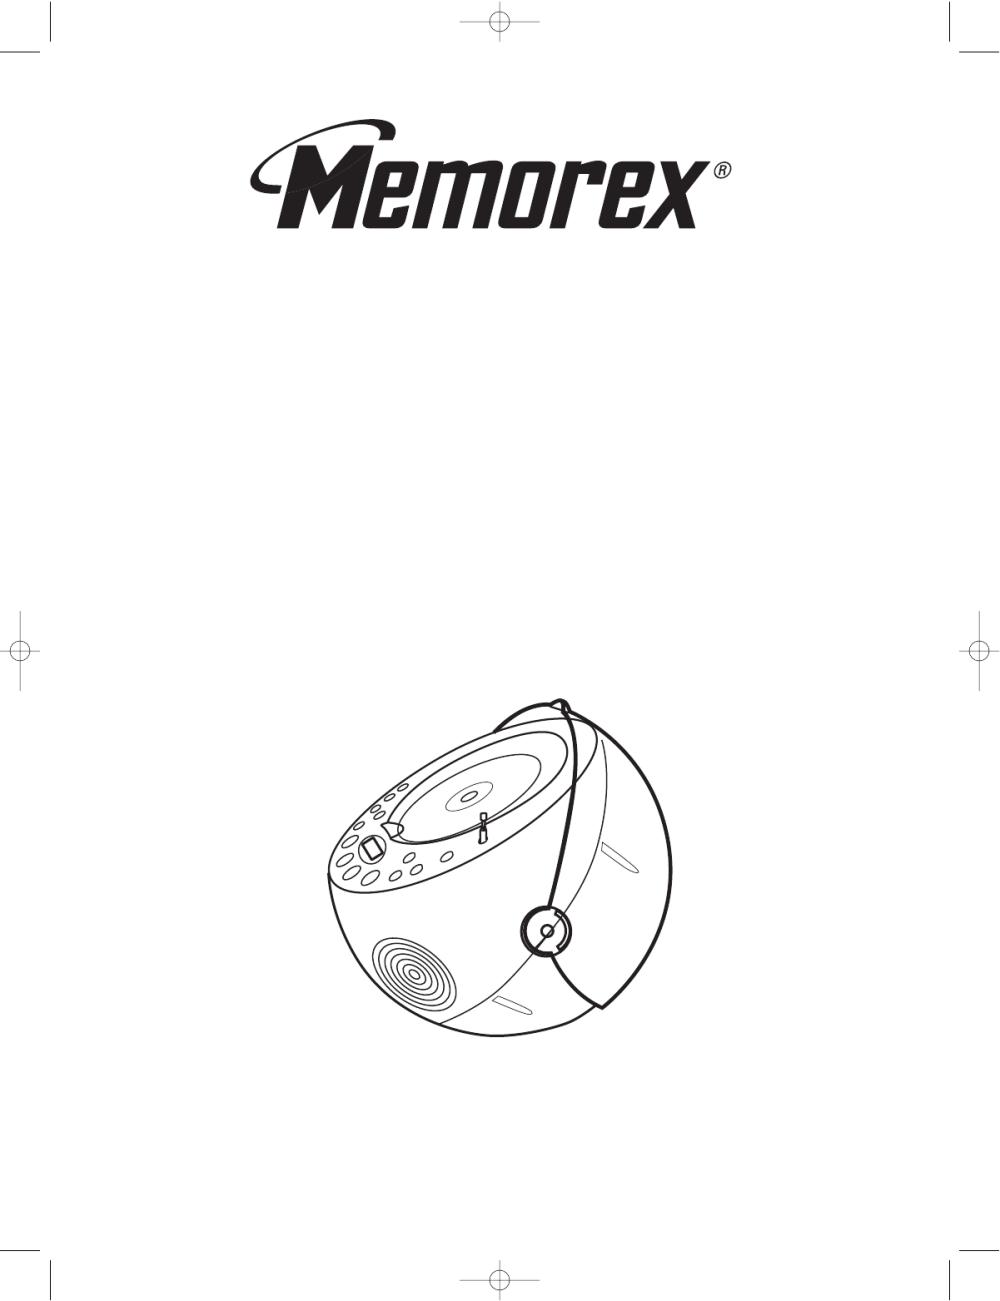 medium resolution of memorex msp bx1600 users manual bx1600 ommemorex wiring diagram 18